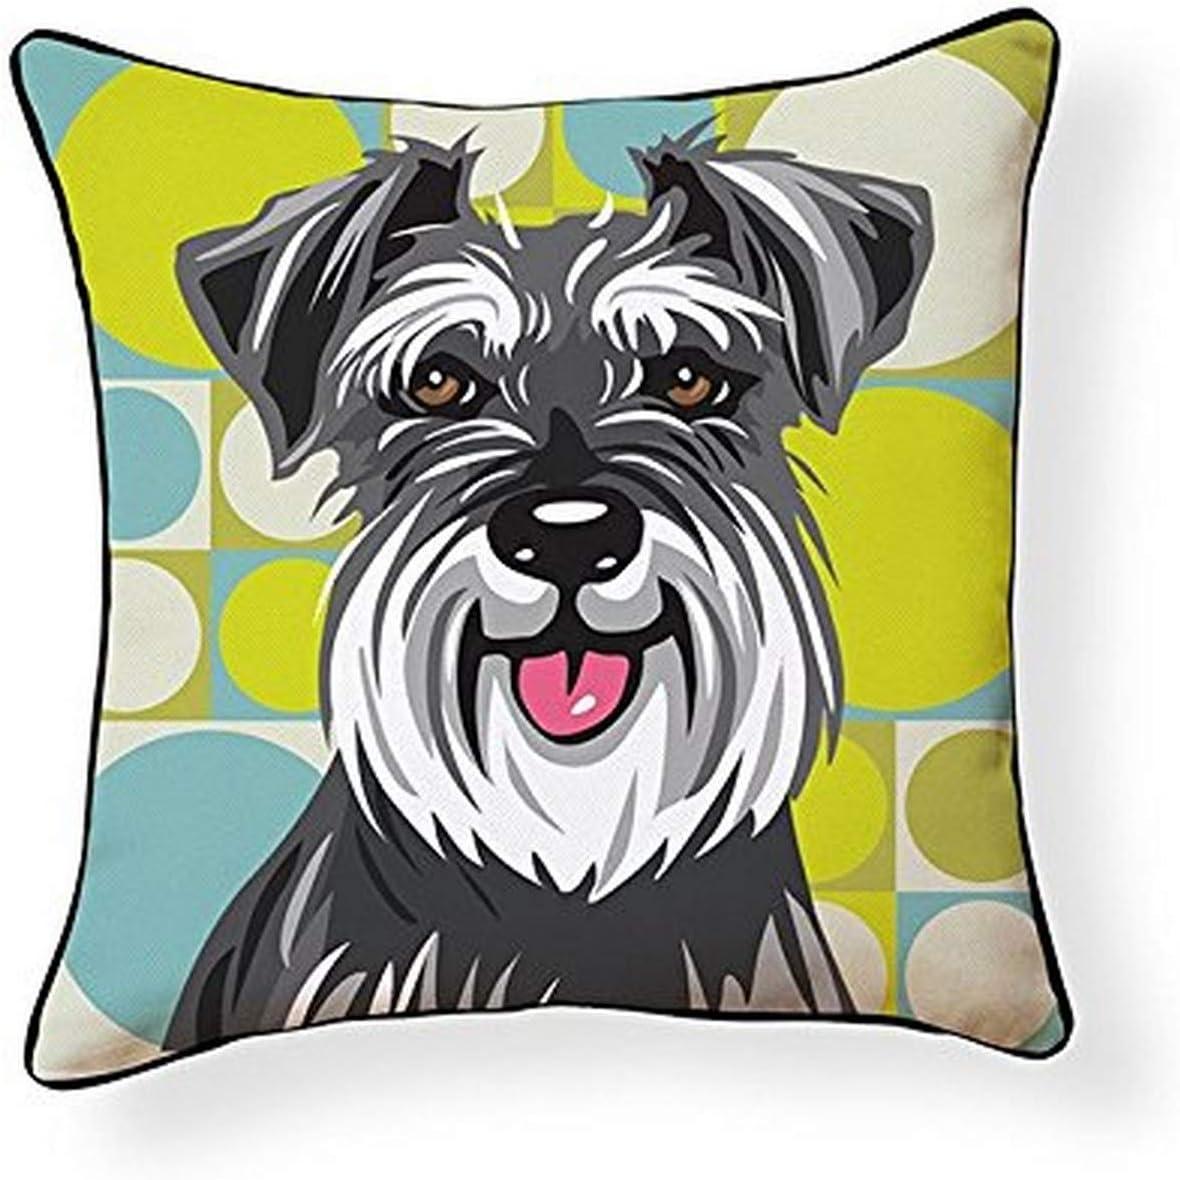 basset hound cushion by hunkydory home